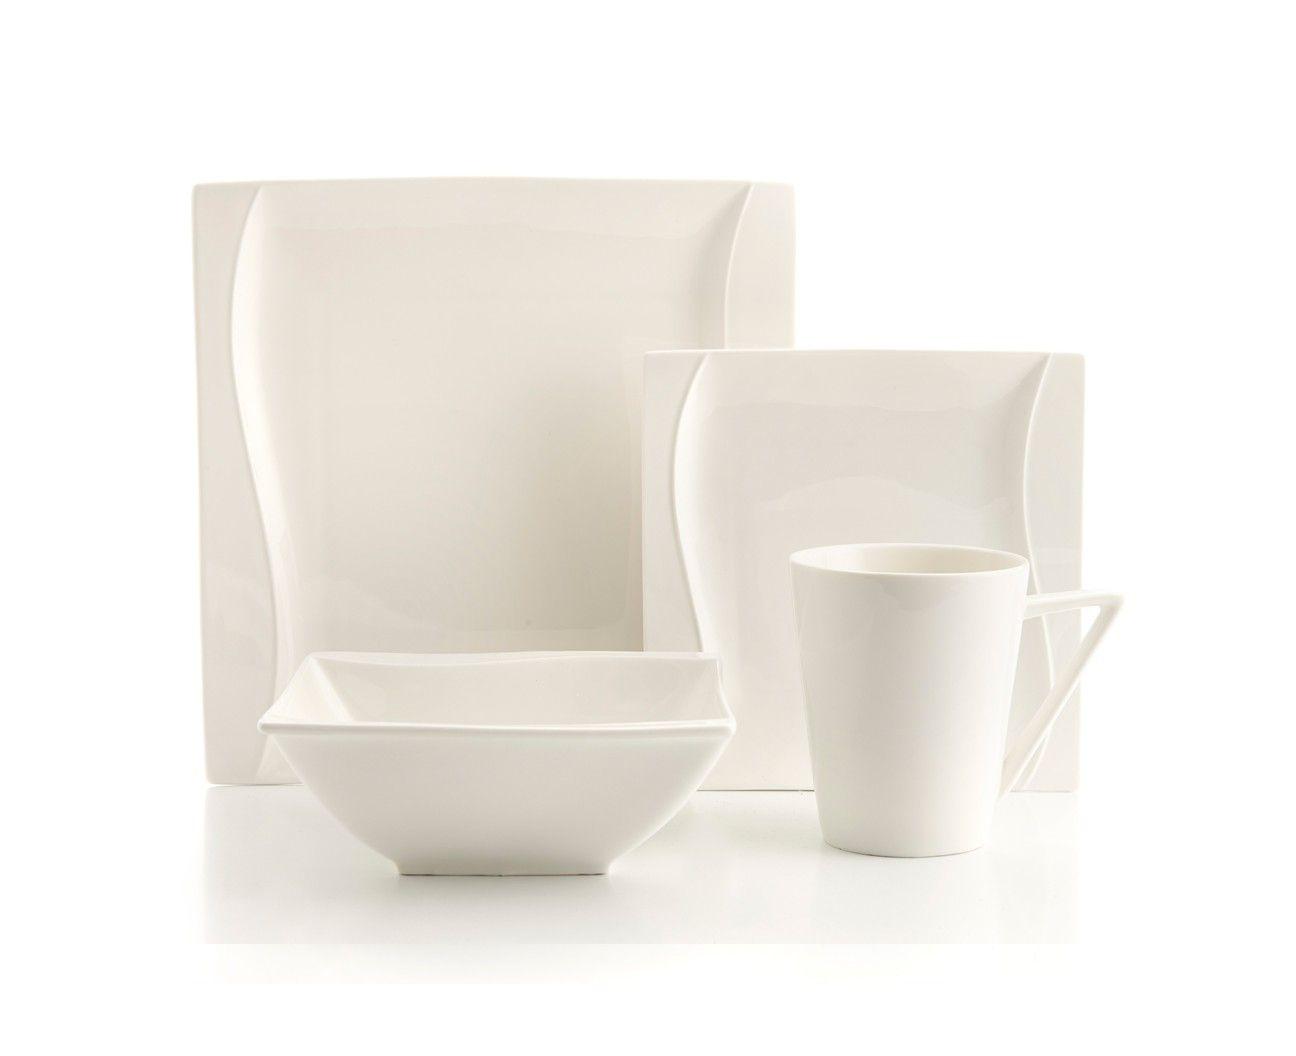 ZEN WHITE 16-PIECE DINNERWARE SET - Dinnerware - Dining | Stokes Inc. Canada\u0027s  sc 1 st  Pinterest & ZEN WHITE 16-PIECE DINNERWARE SET - Dinnerware - Dining | Stokes Inc ...